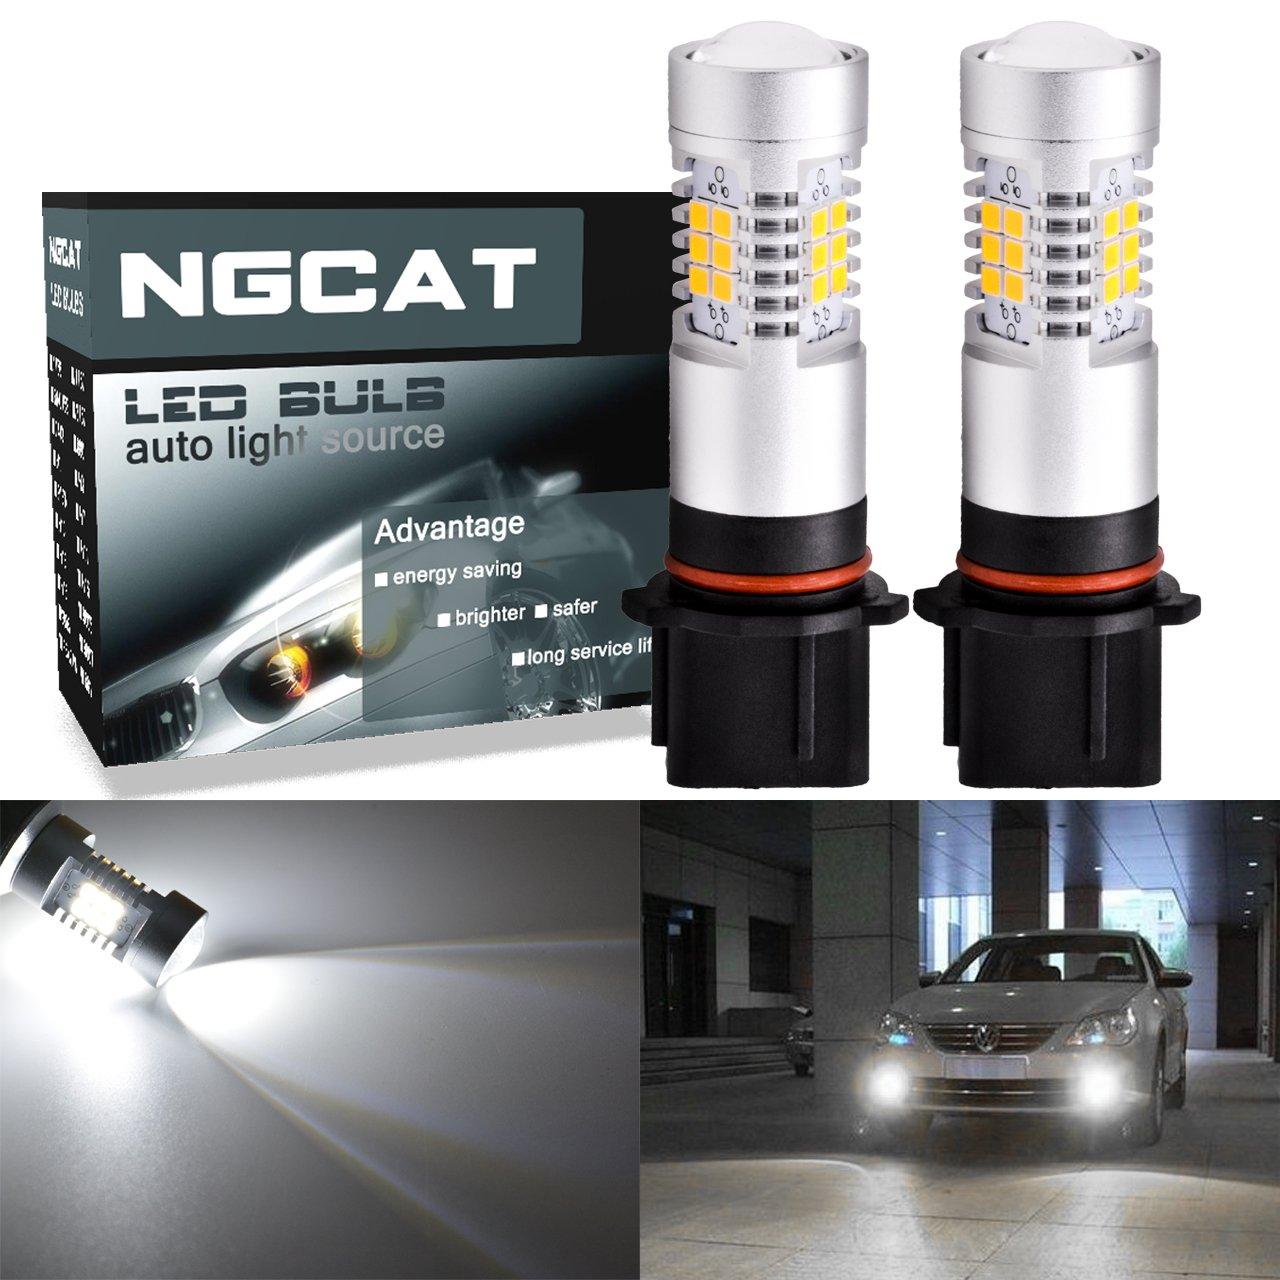 ngcat Auto bombilla LED 2pcs h4 DRL Niebla Luz chipsets 2835 21 SMD bombillas LED con lentes de repuesto proyector coche conducció n luces de conducció n diurna, Xenon Blanco, 10 –  16 V 10,5 W